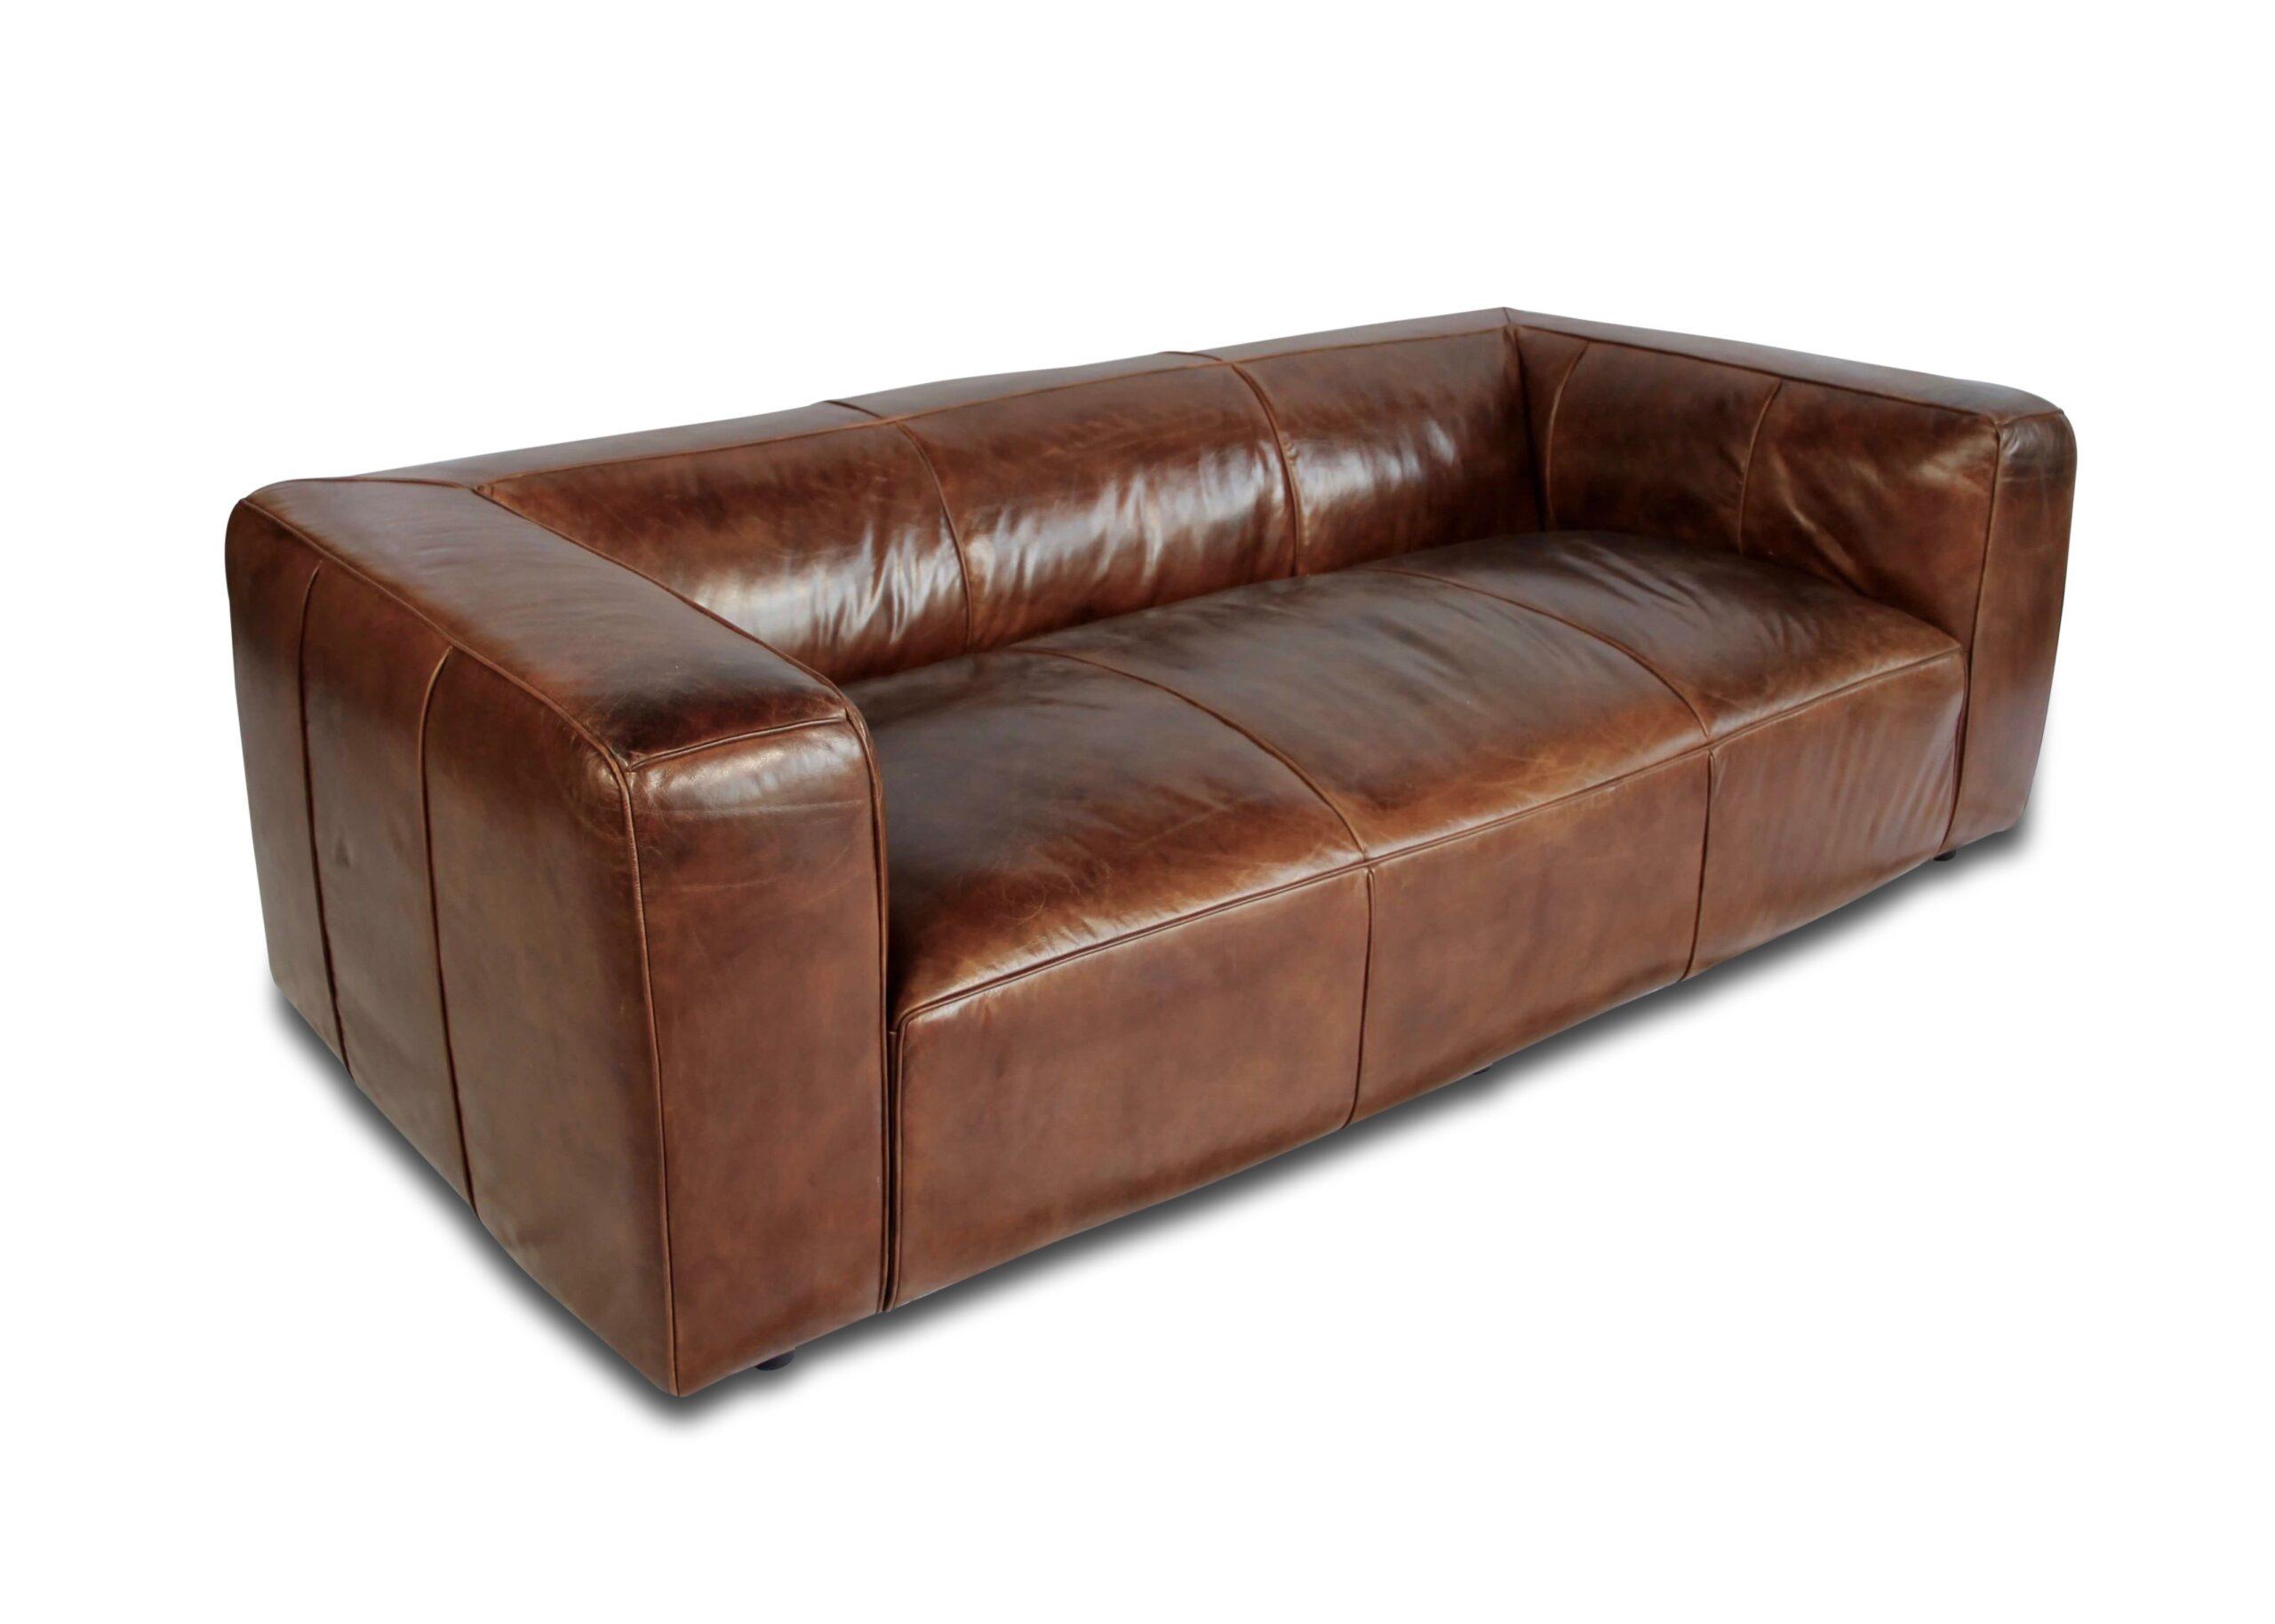 Full Size of Sofa Leder Braun Couch Vintage 3 Sitzer   Chesterfield Ikea Otto Rustikal 3 2 1 2 Sitzer Set Ledersofa Design Gebraucht Kunstleder Hay Mags Grau Stoff Sofa Sofa Leder Braun